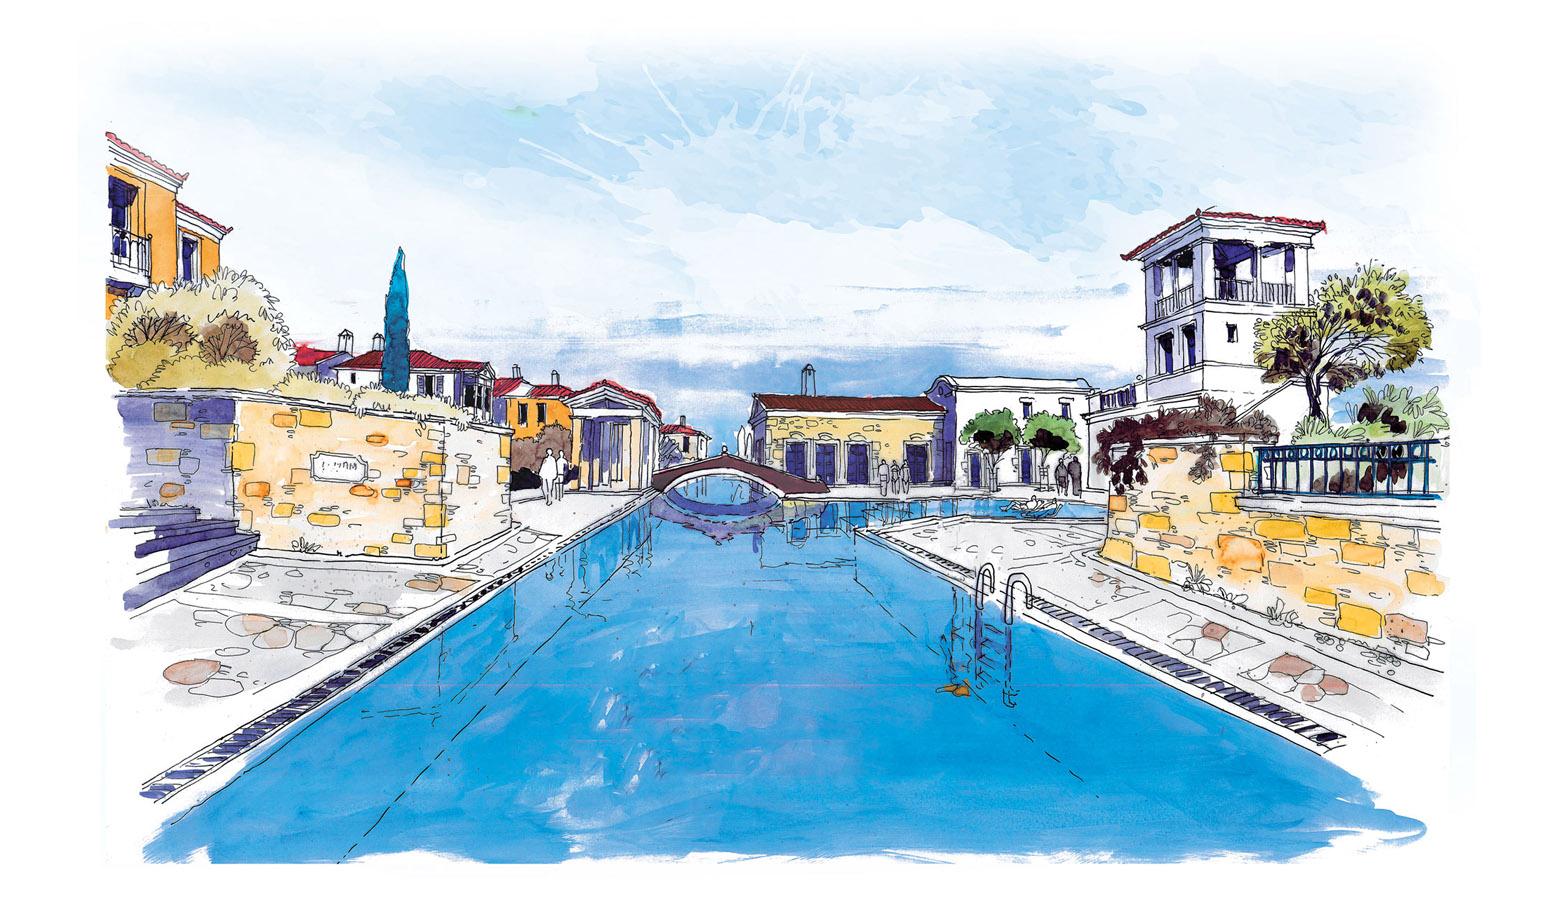 Mi'Marin Köyce Alaçatı 3D Havuz